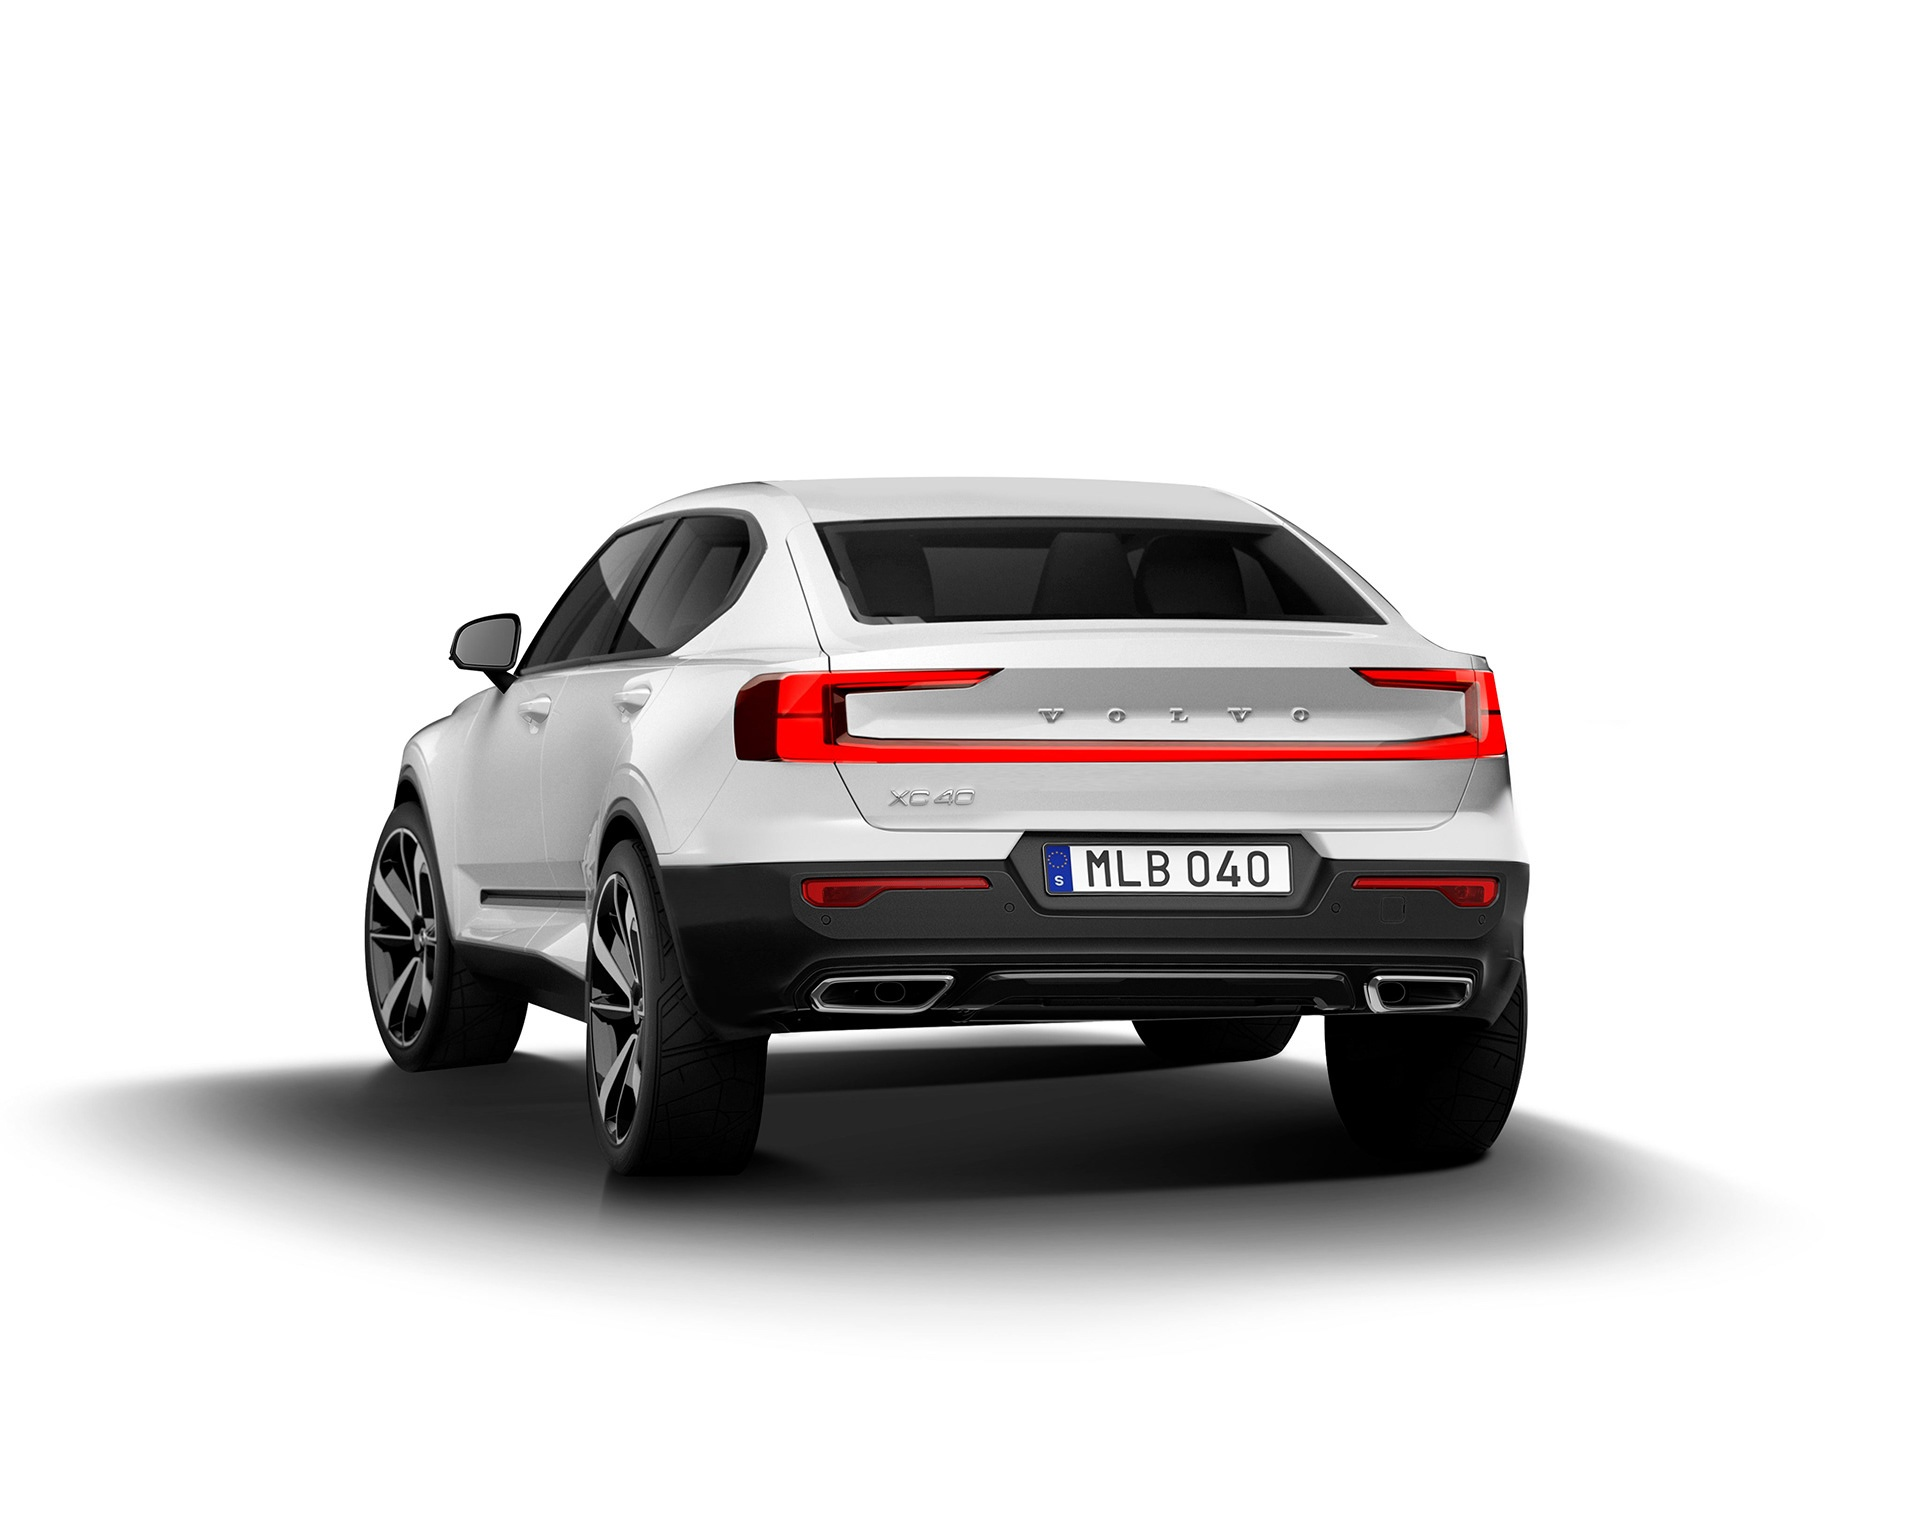 XC40 Coupe